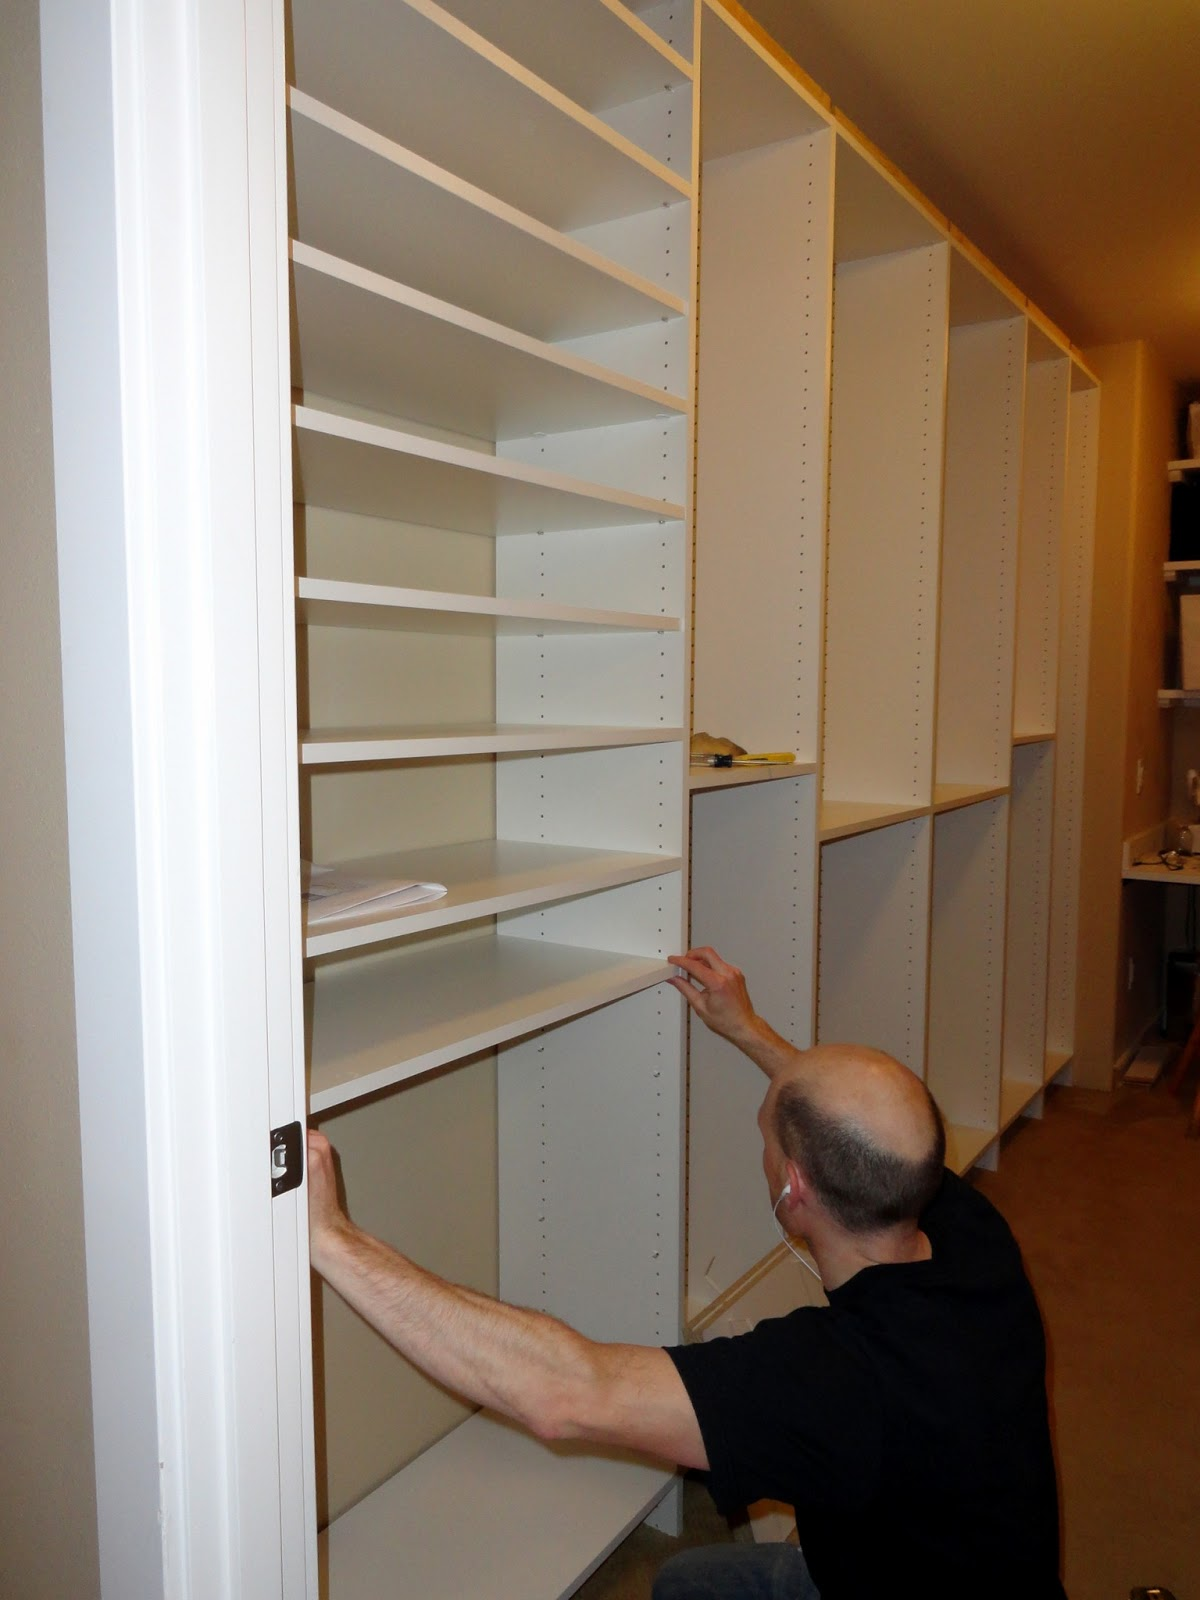 master closet built in progress rachel teodoro. Black Bedroom Furniture Sets. Home Design Ideas